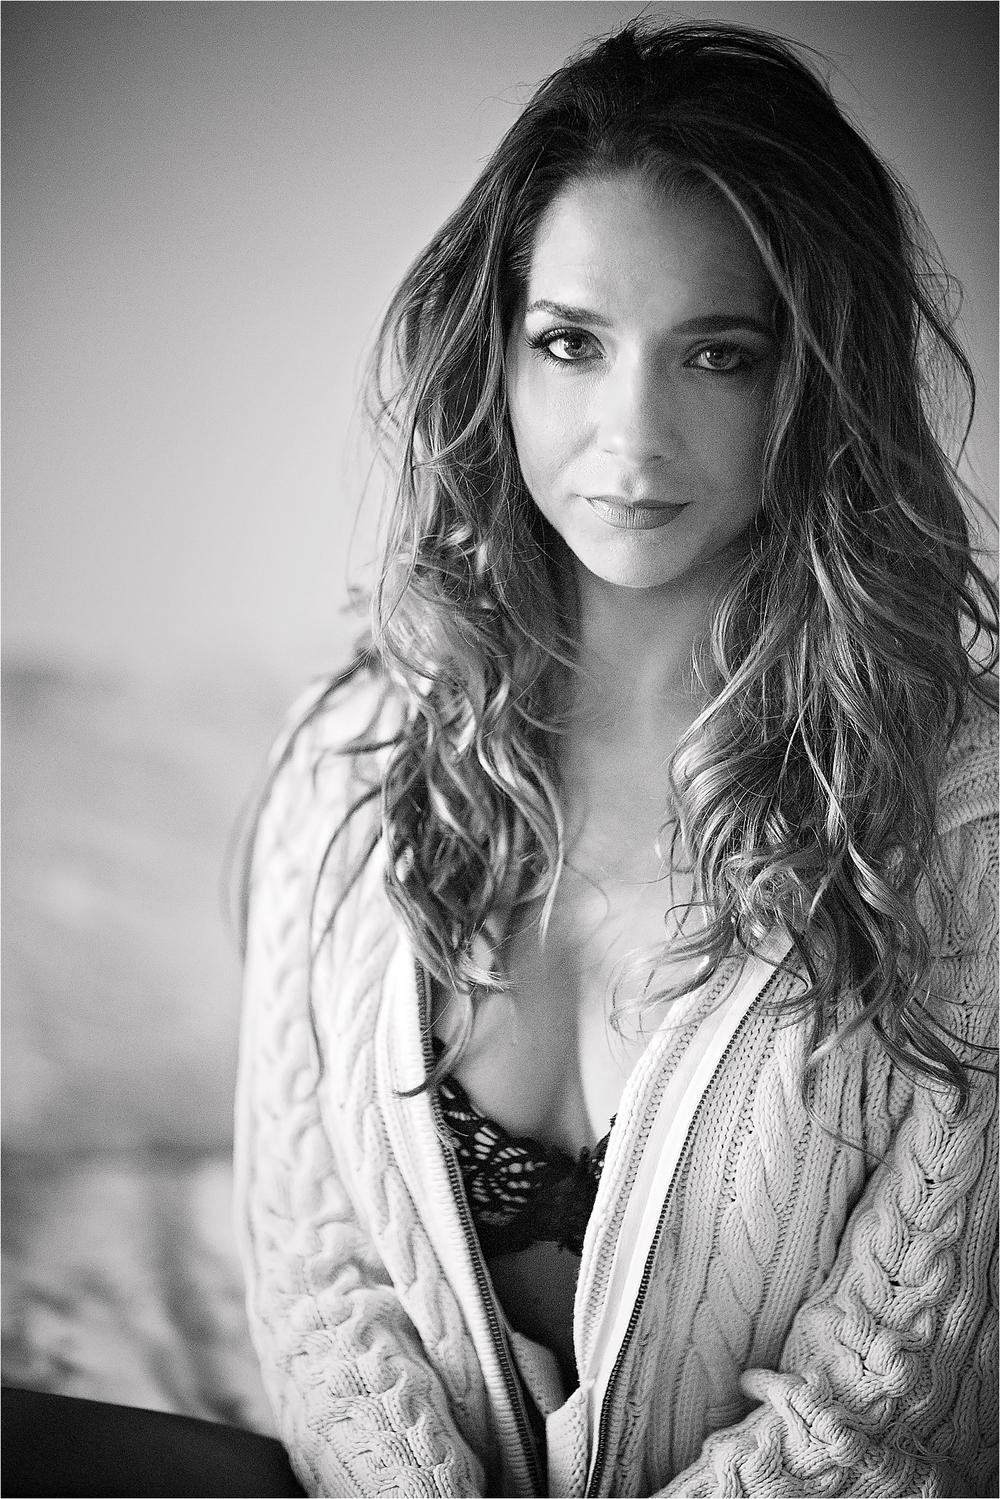 FLORIDA BOUDOIR PHOTOGRAPHER | NICHOLE MARIE